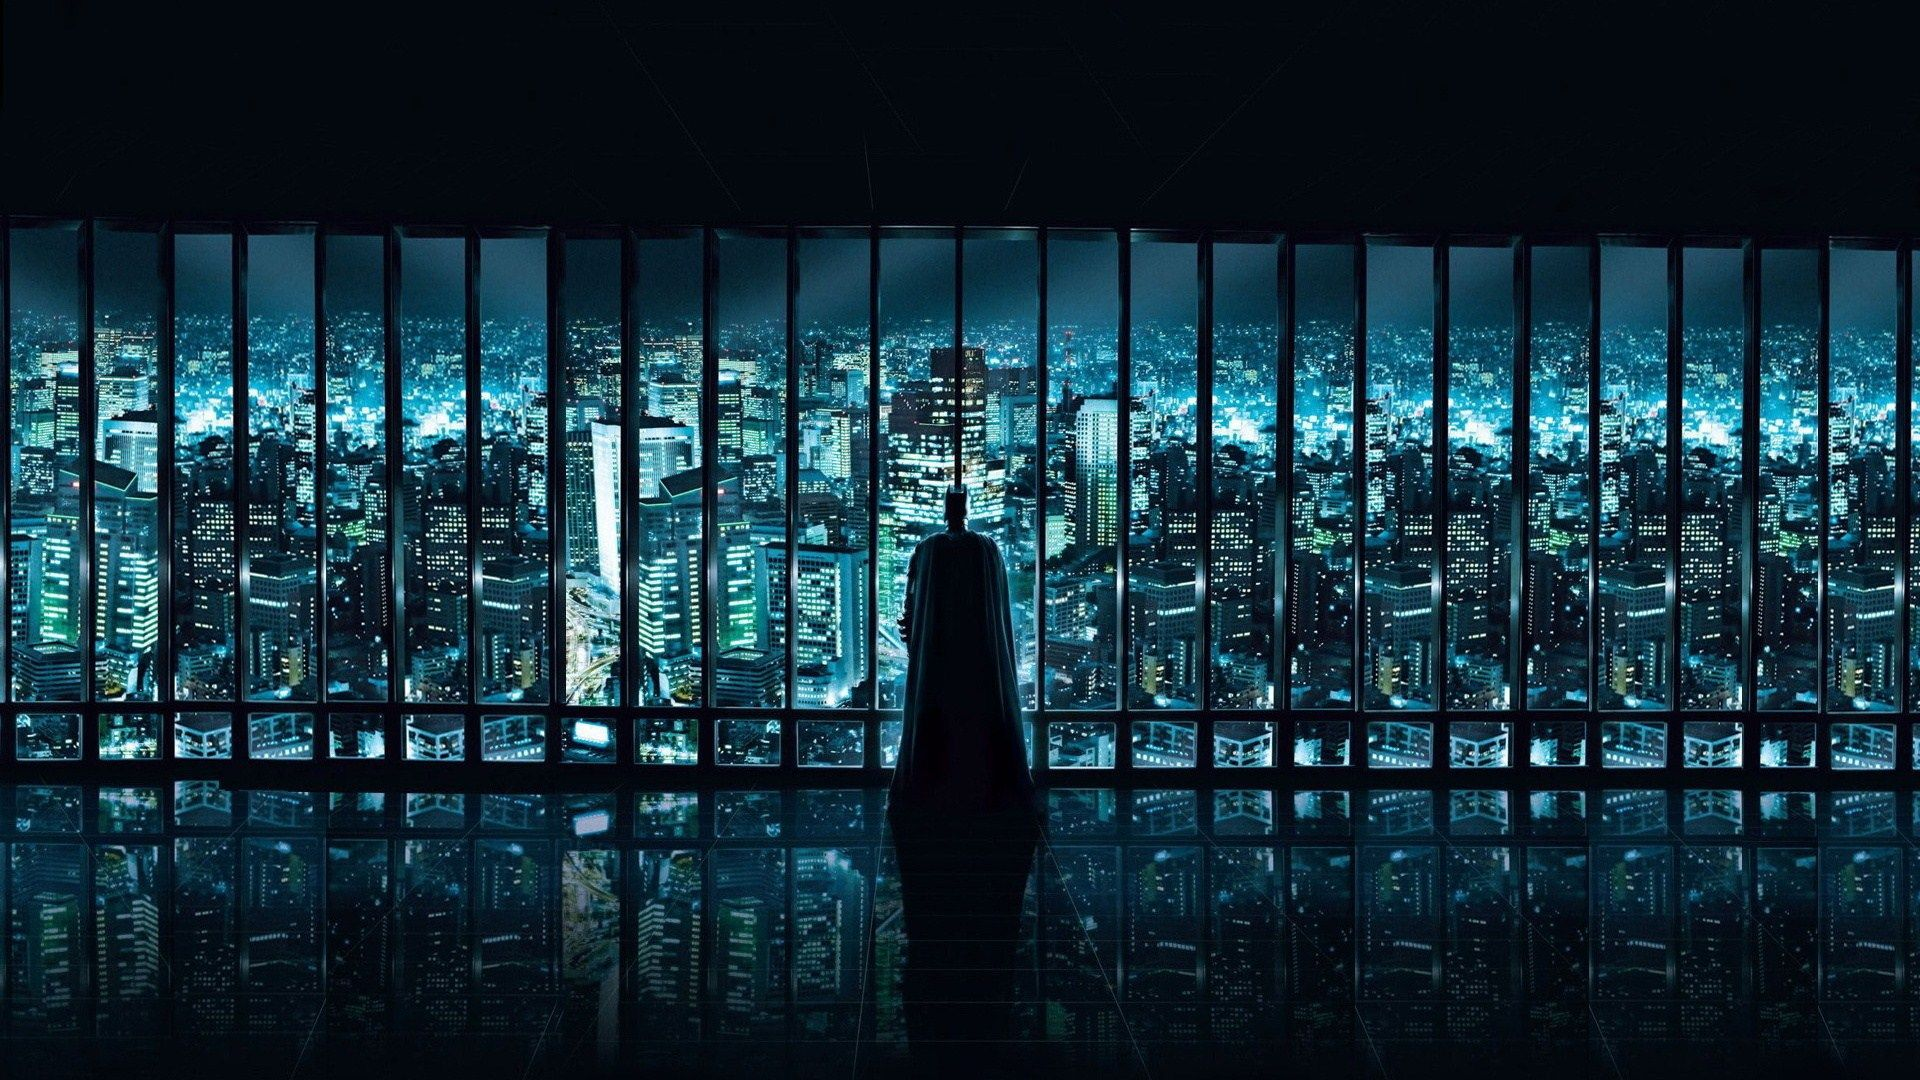 Hd Batman Wallpapers Wallpaper 1920x1080